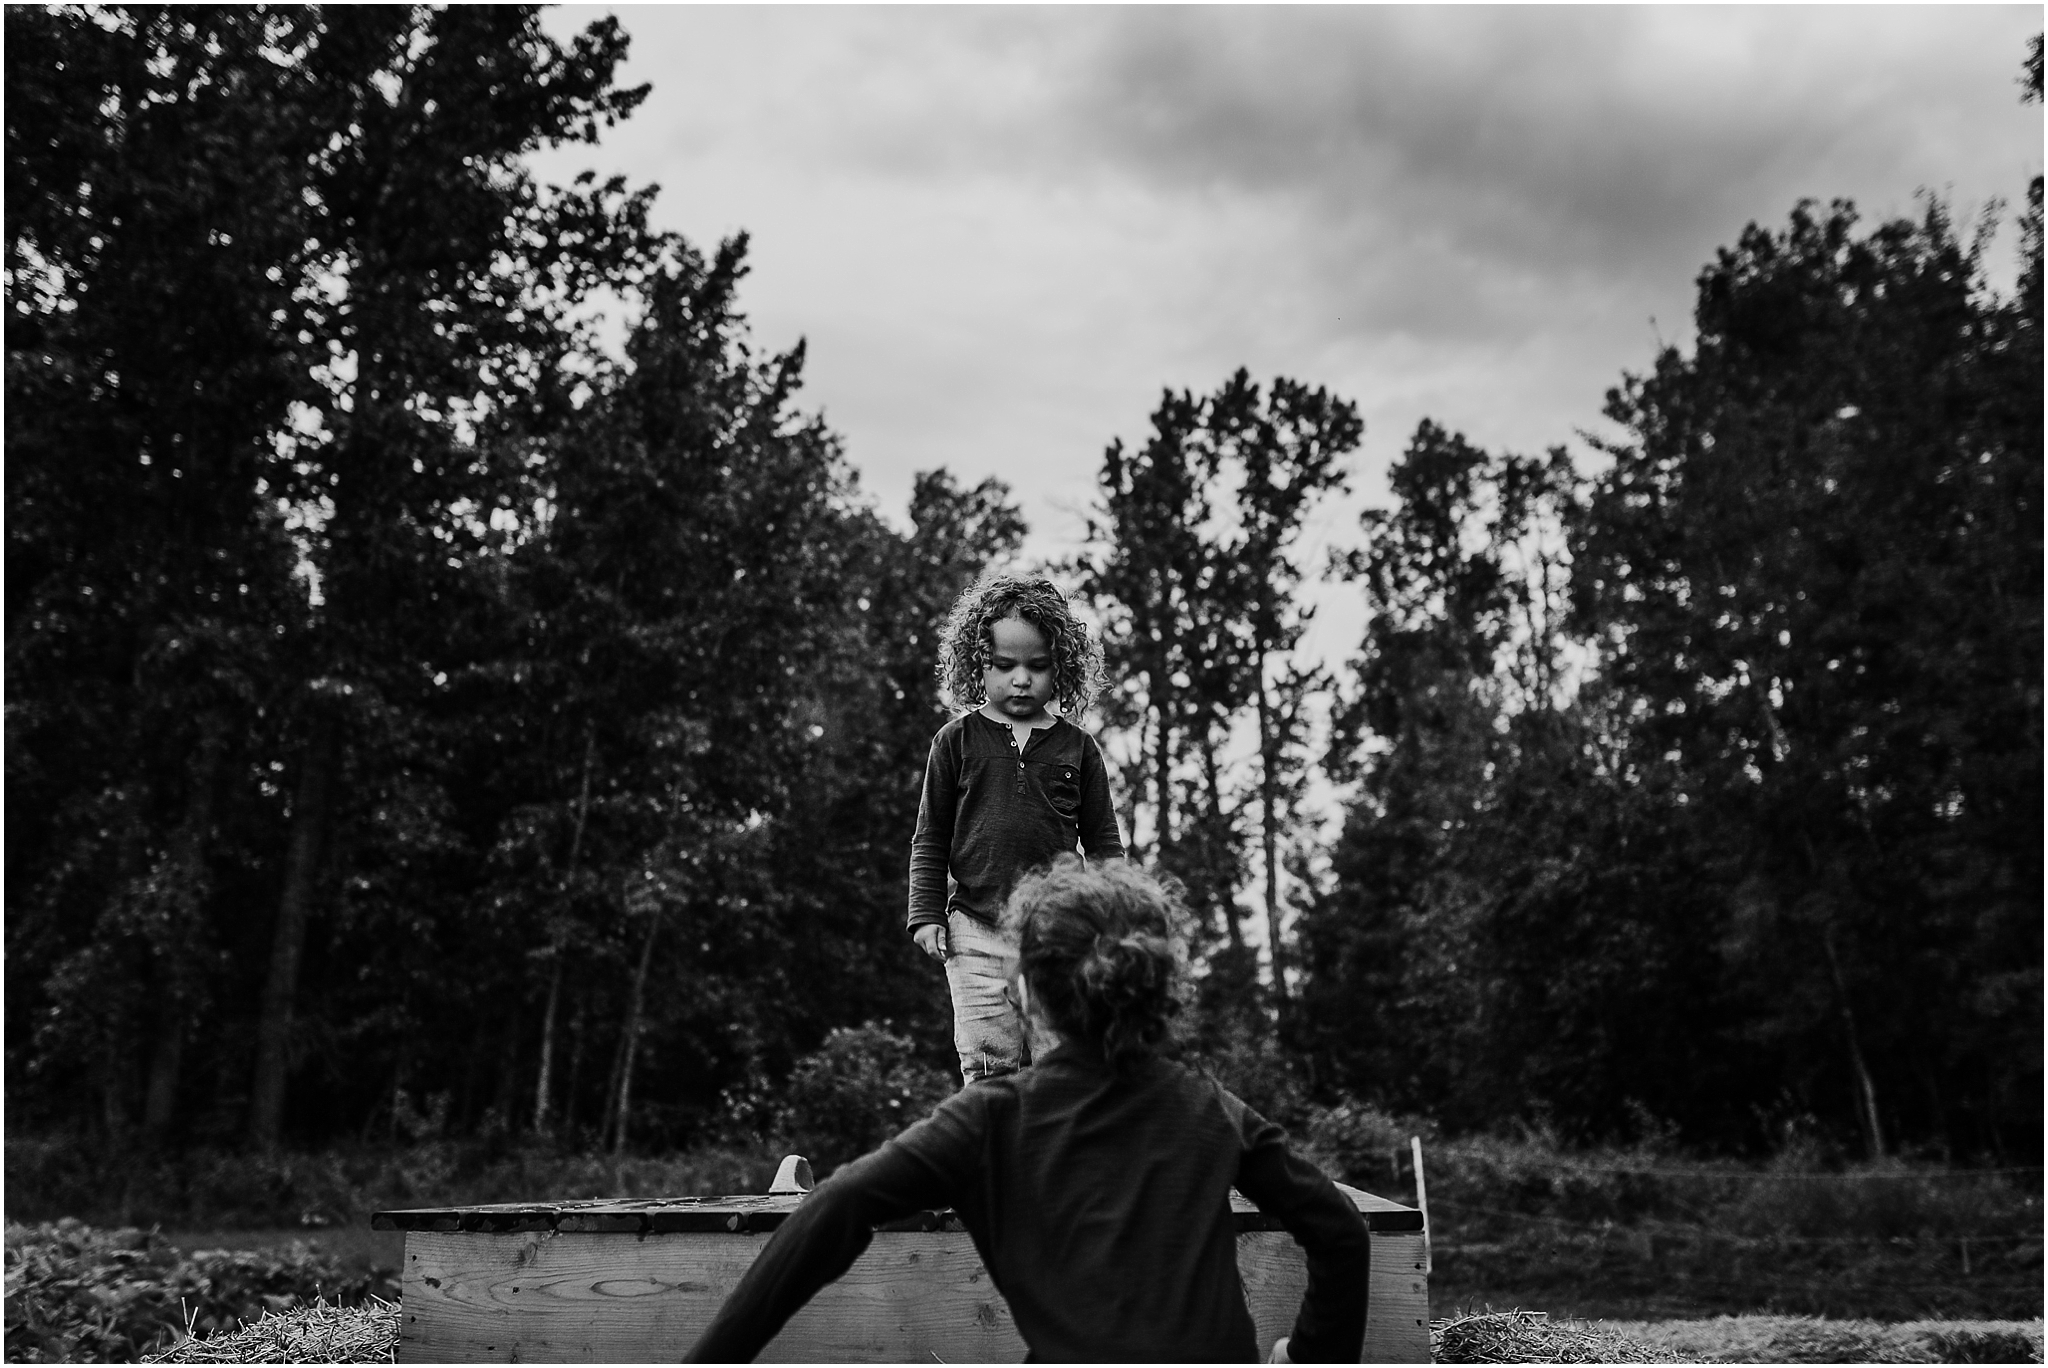 Edmonton Photographer - Edmonton Pumpkin Patch - Somerset Farms - Edmonton Documentary Photographer